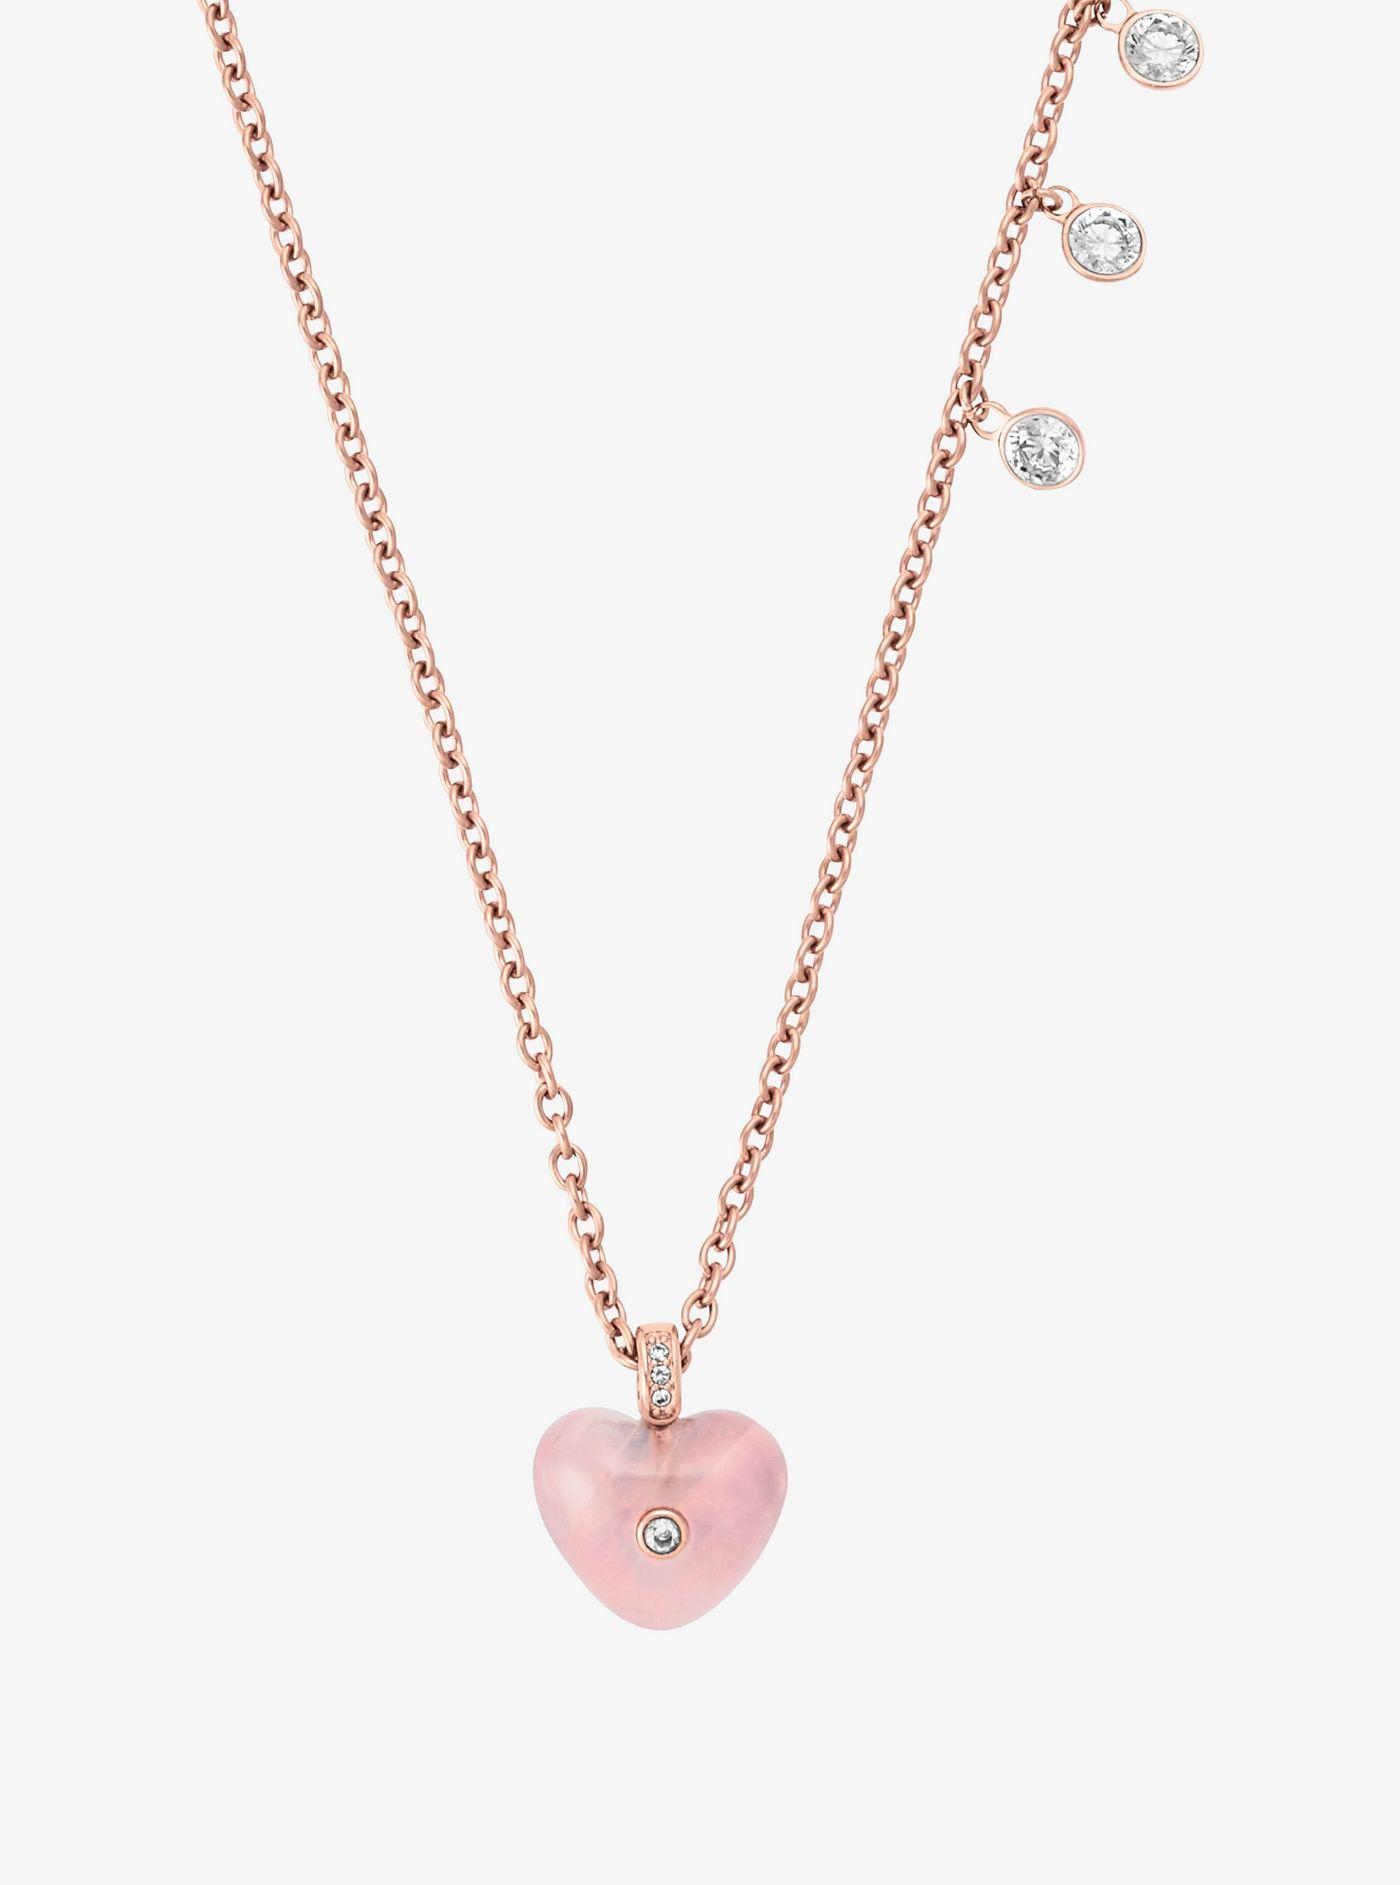 4c17b5dfaa25 Michael Kors Heart Necklace - Necklace Wallpaper Gallerychitrak.Org